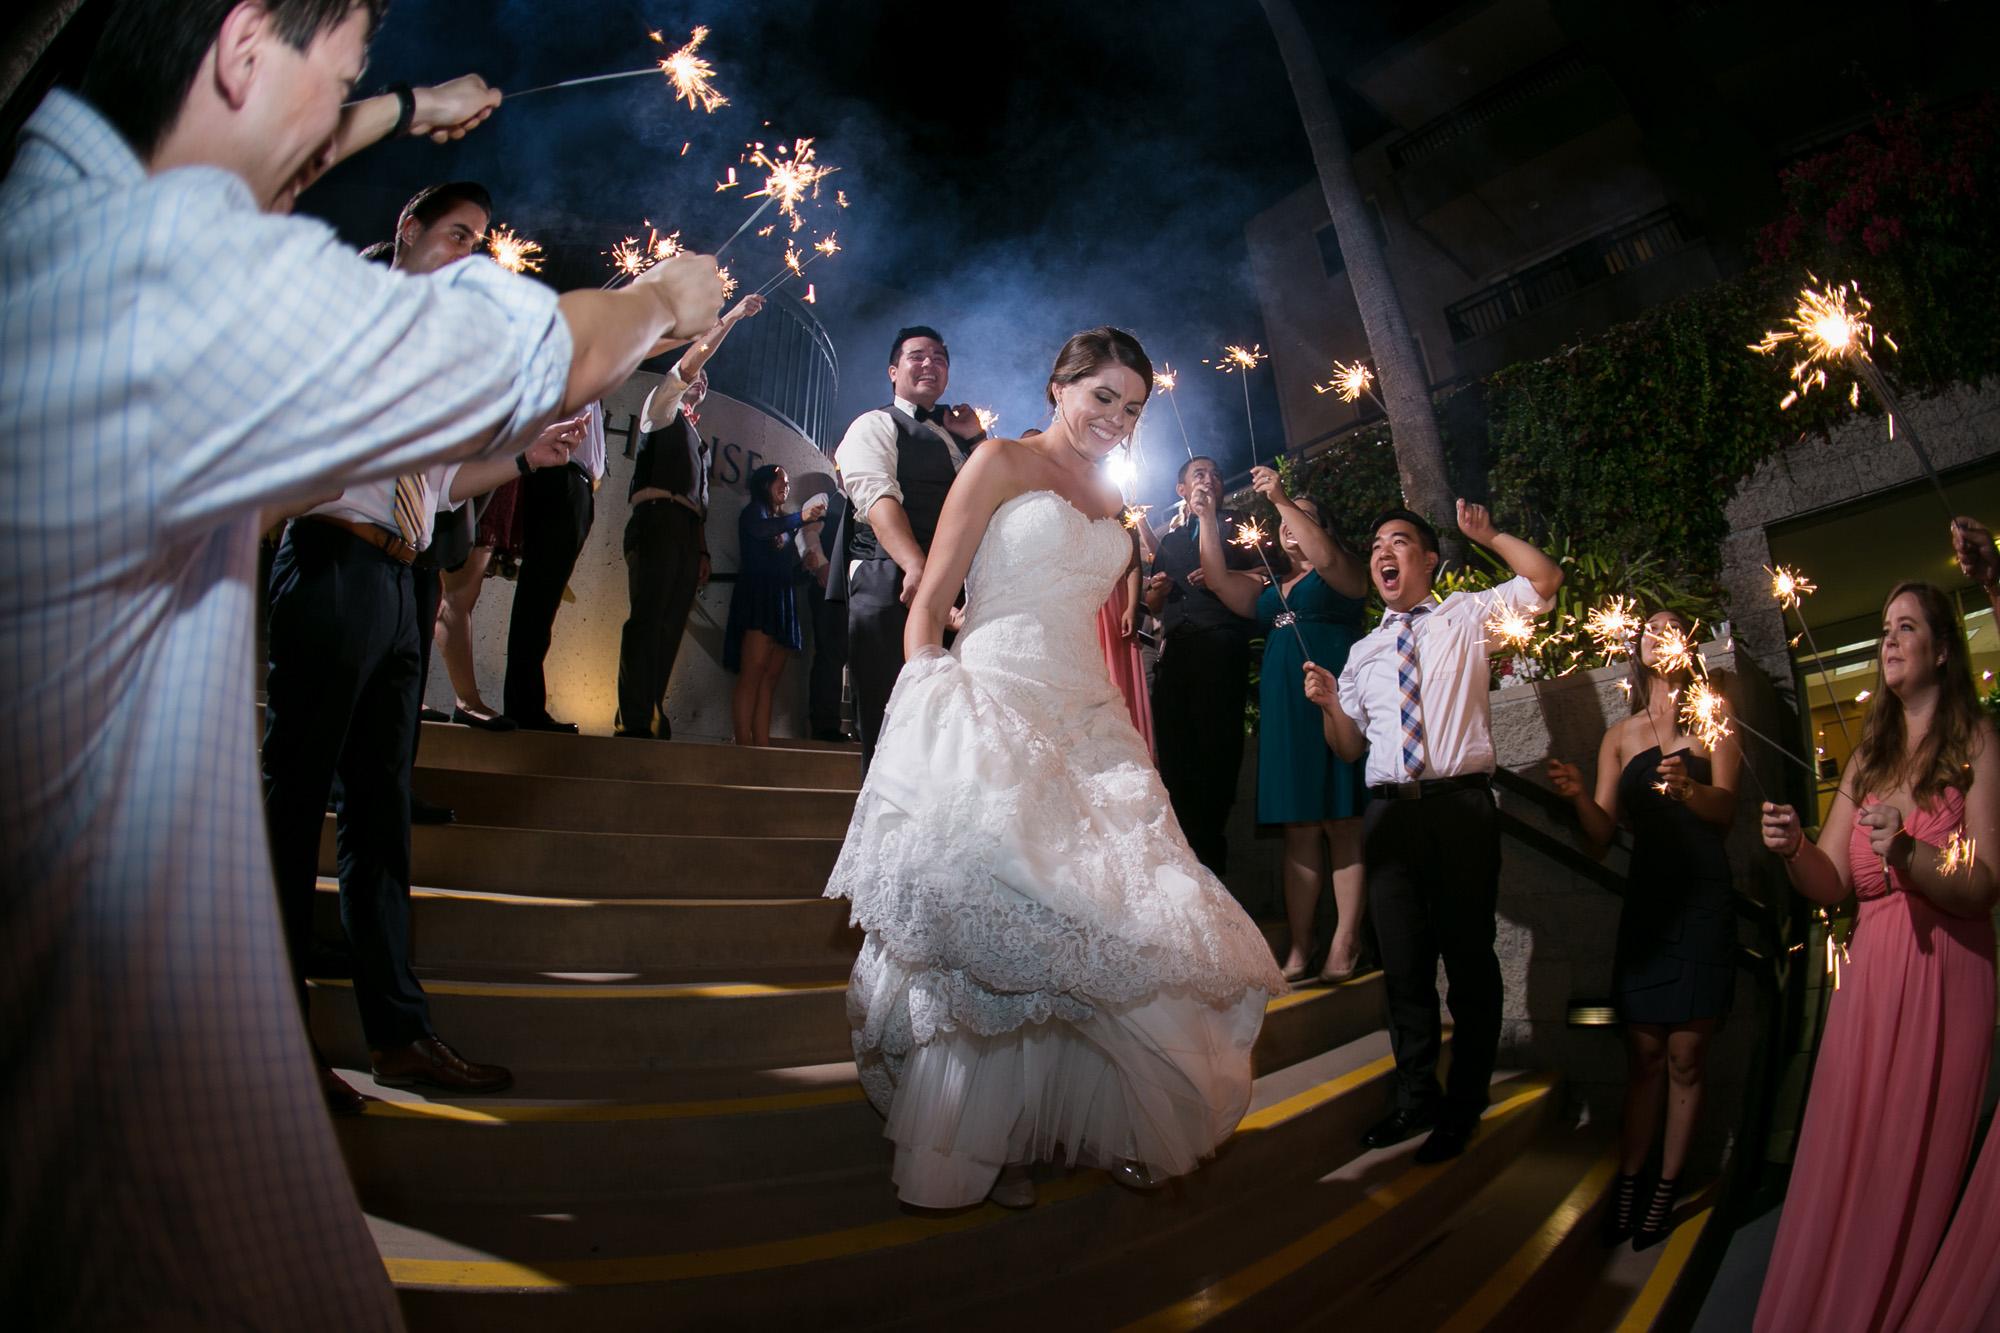 Geoff Kowalchuk BM Wedding Photography-021.jpg